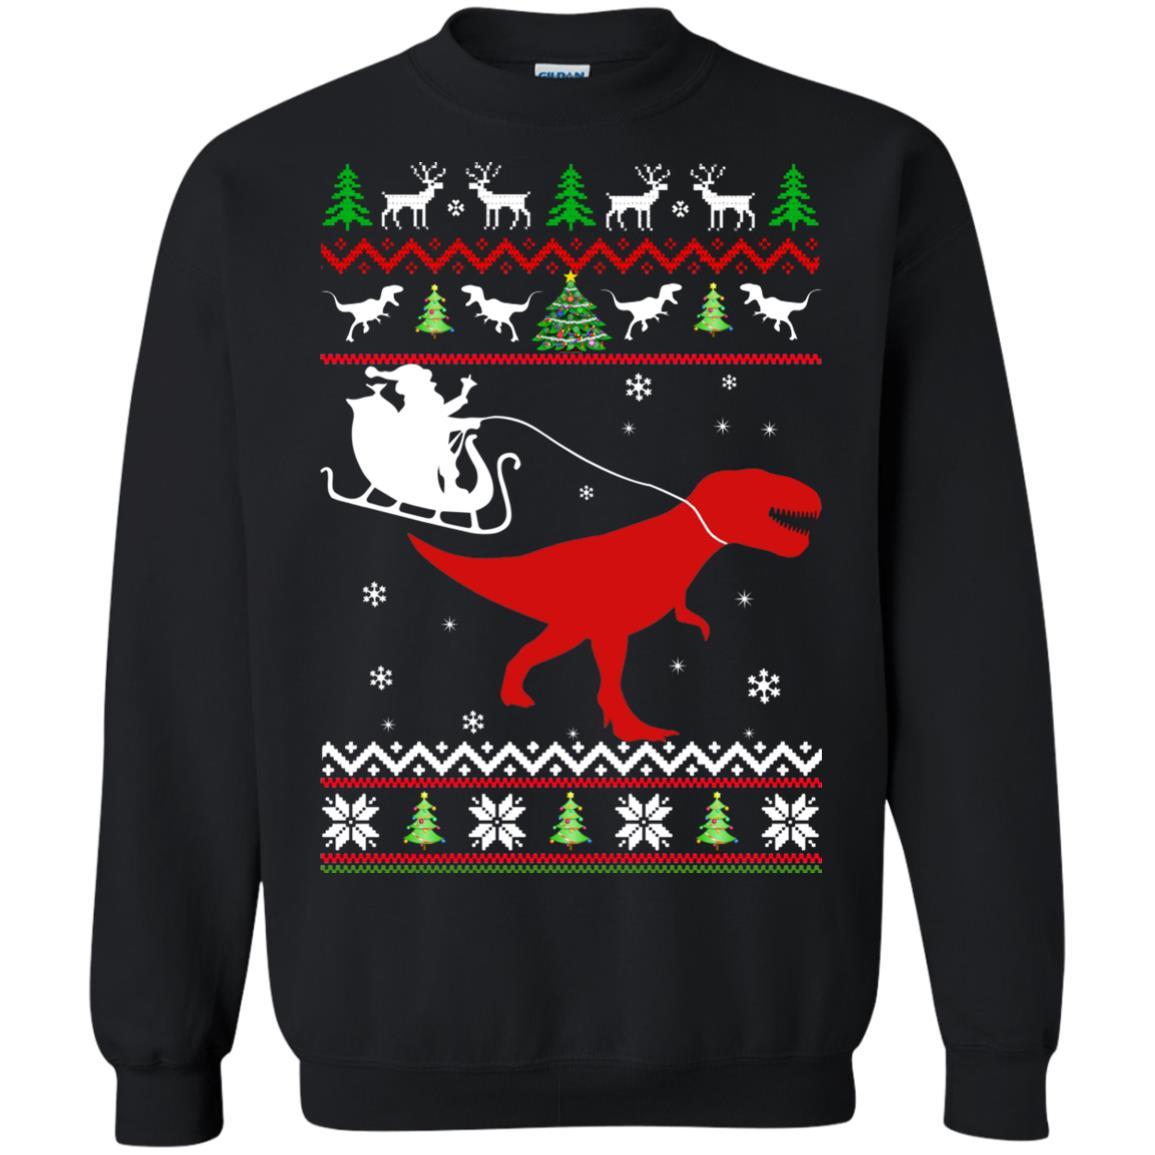 Dinosaur Christmas Sweater.Santa Rides T Rex Sweater Christmas Santa Rides Dinosaur Ugly Sweater